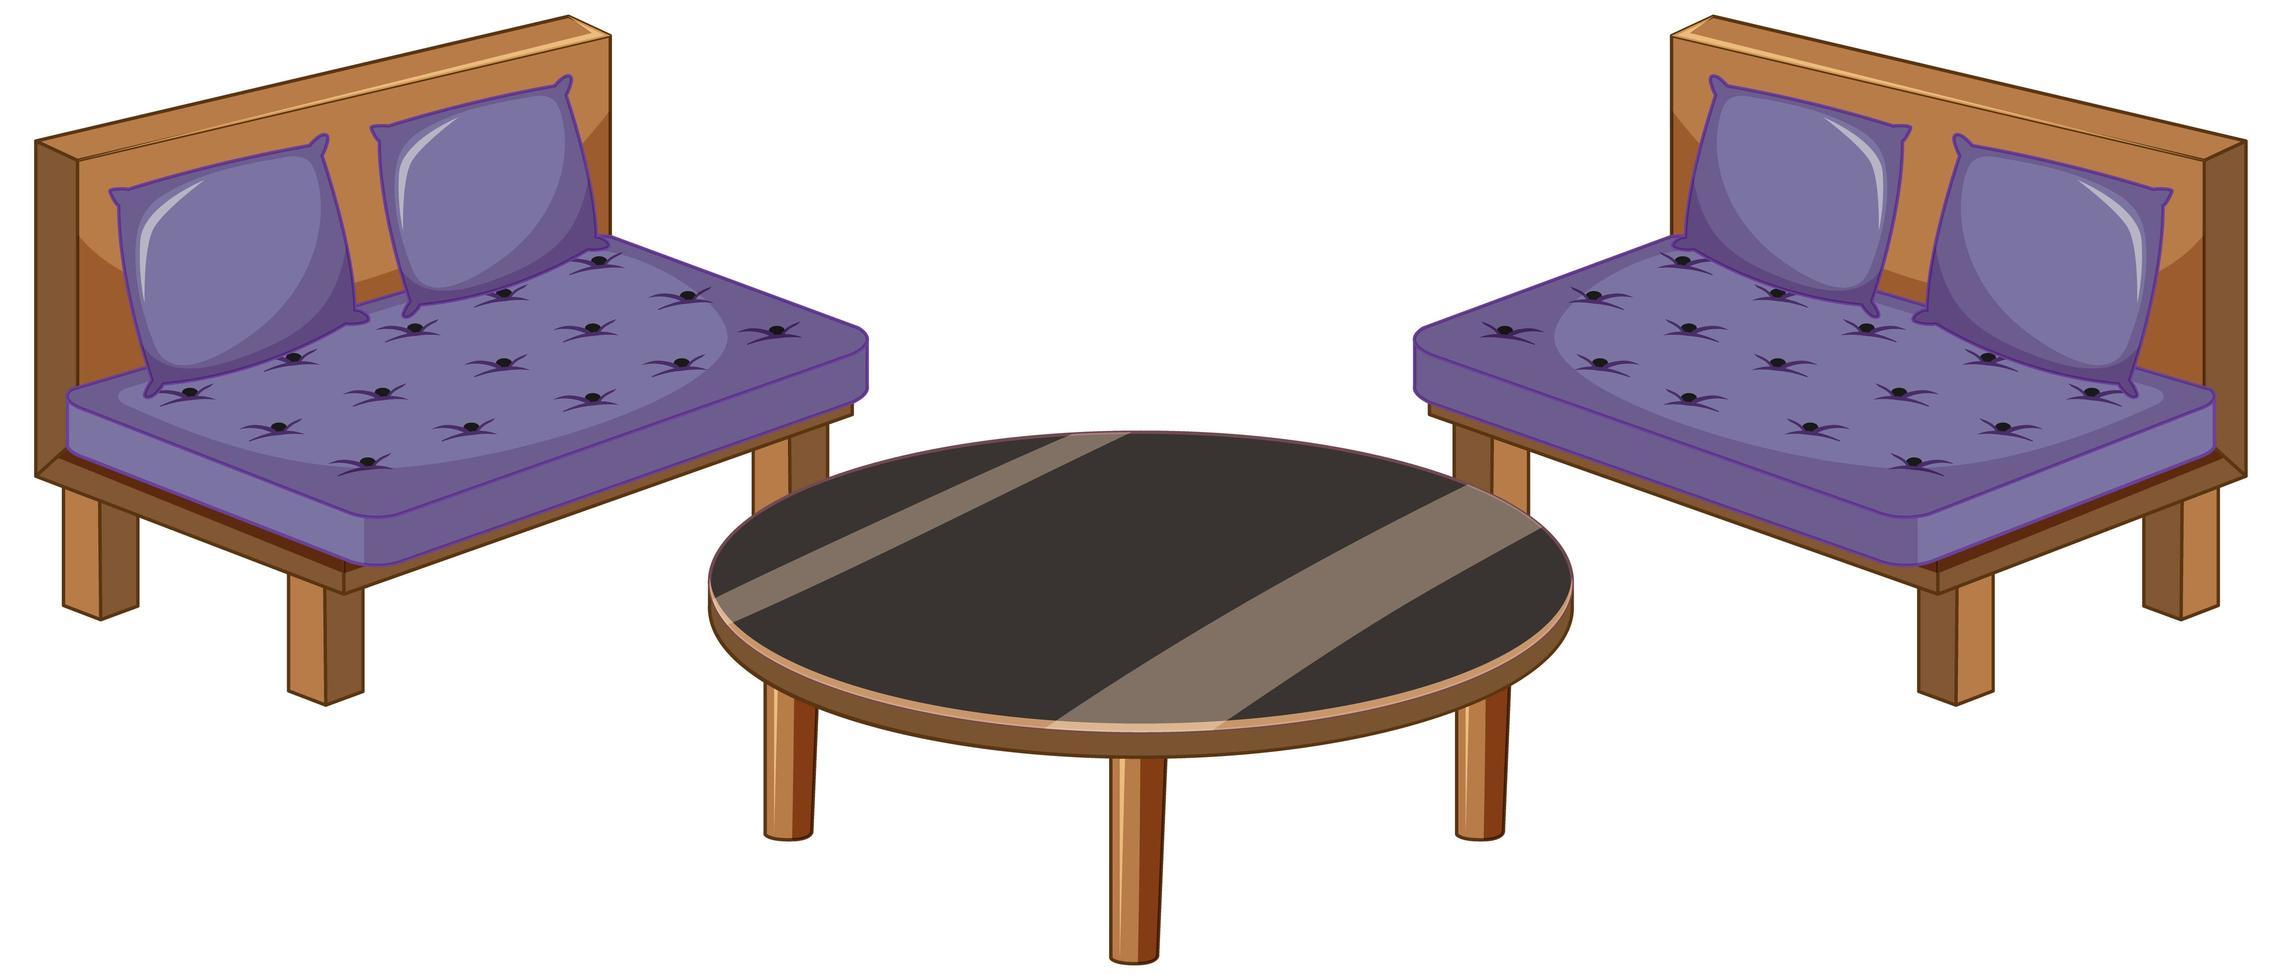 Living room furniture vector